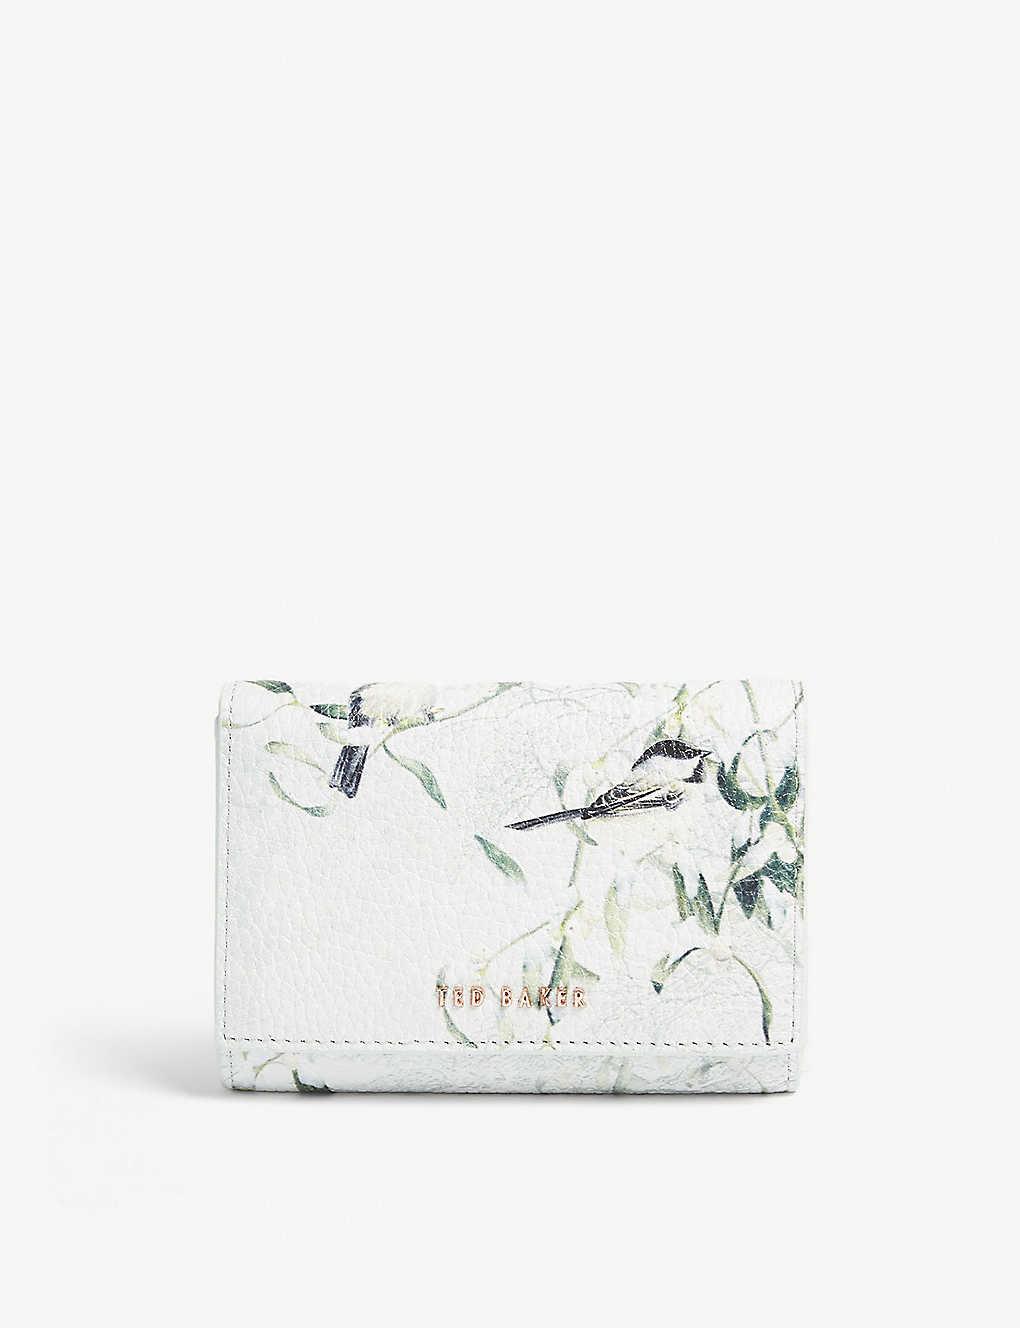 7821369a9e7 TED BAKER - Mistletoe kiss mini purse   Selfridges.com